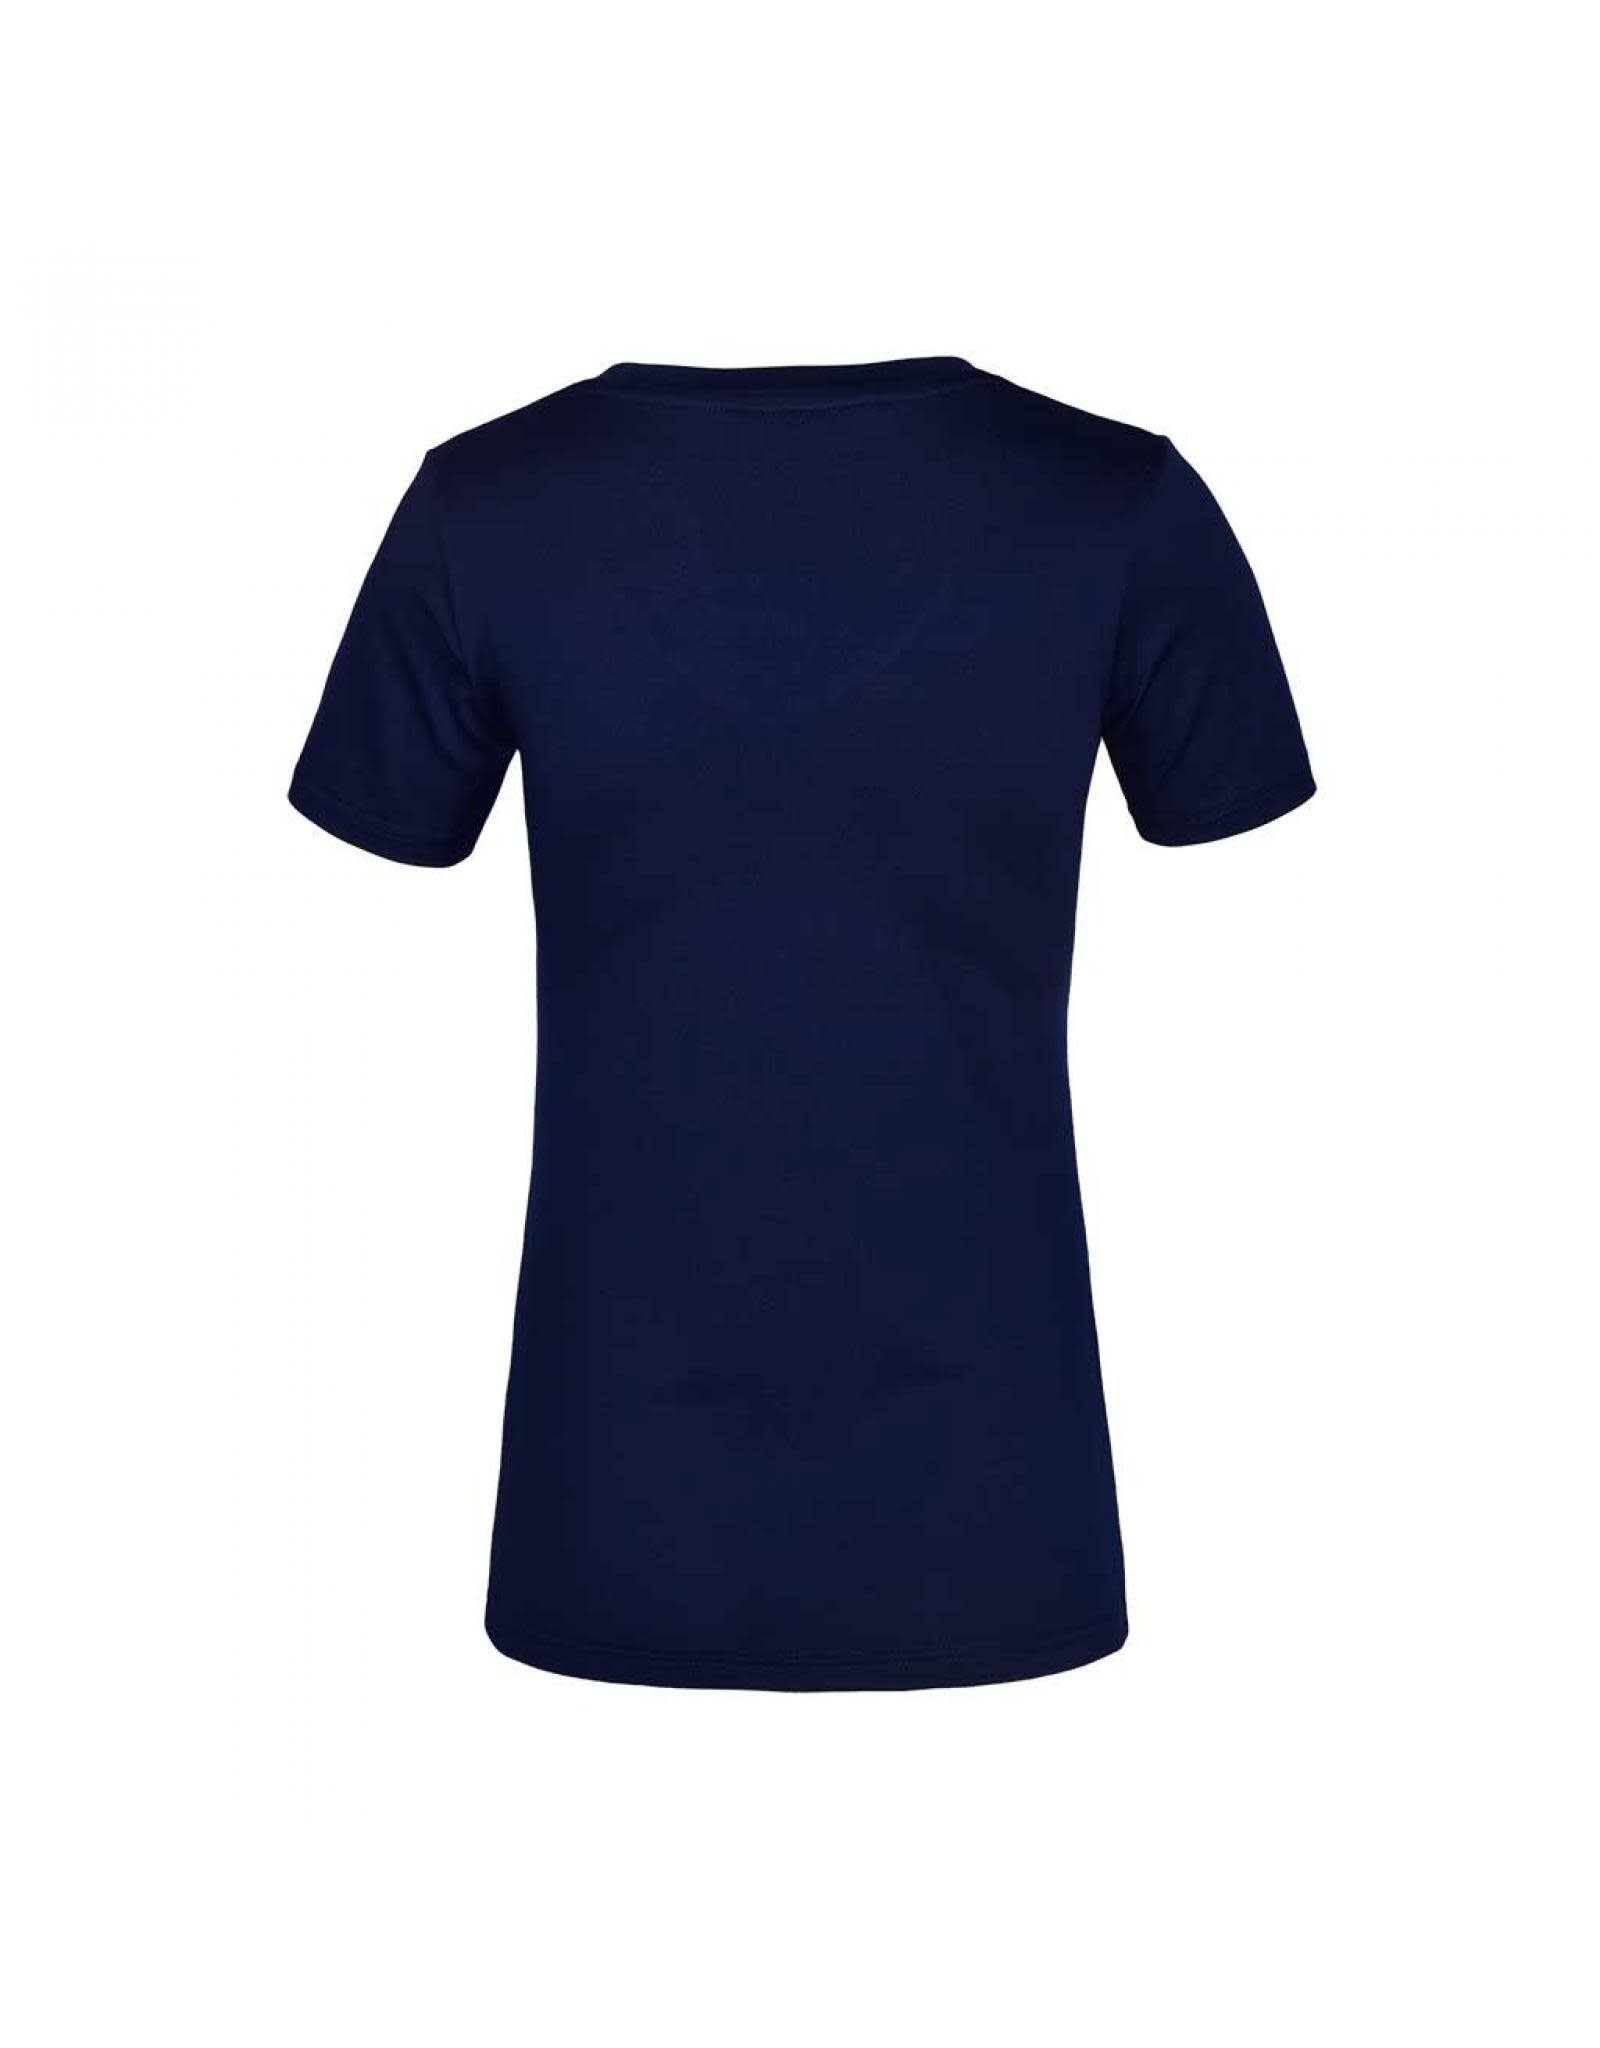 Kingsland KL Luna T-Shirt Navy